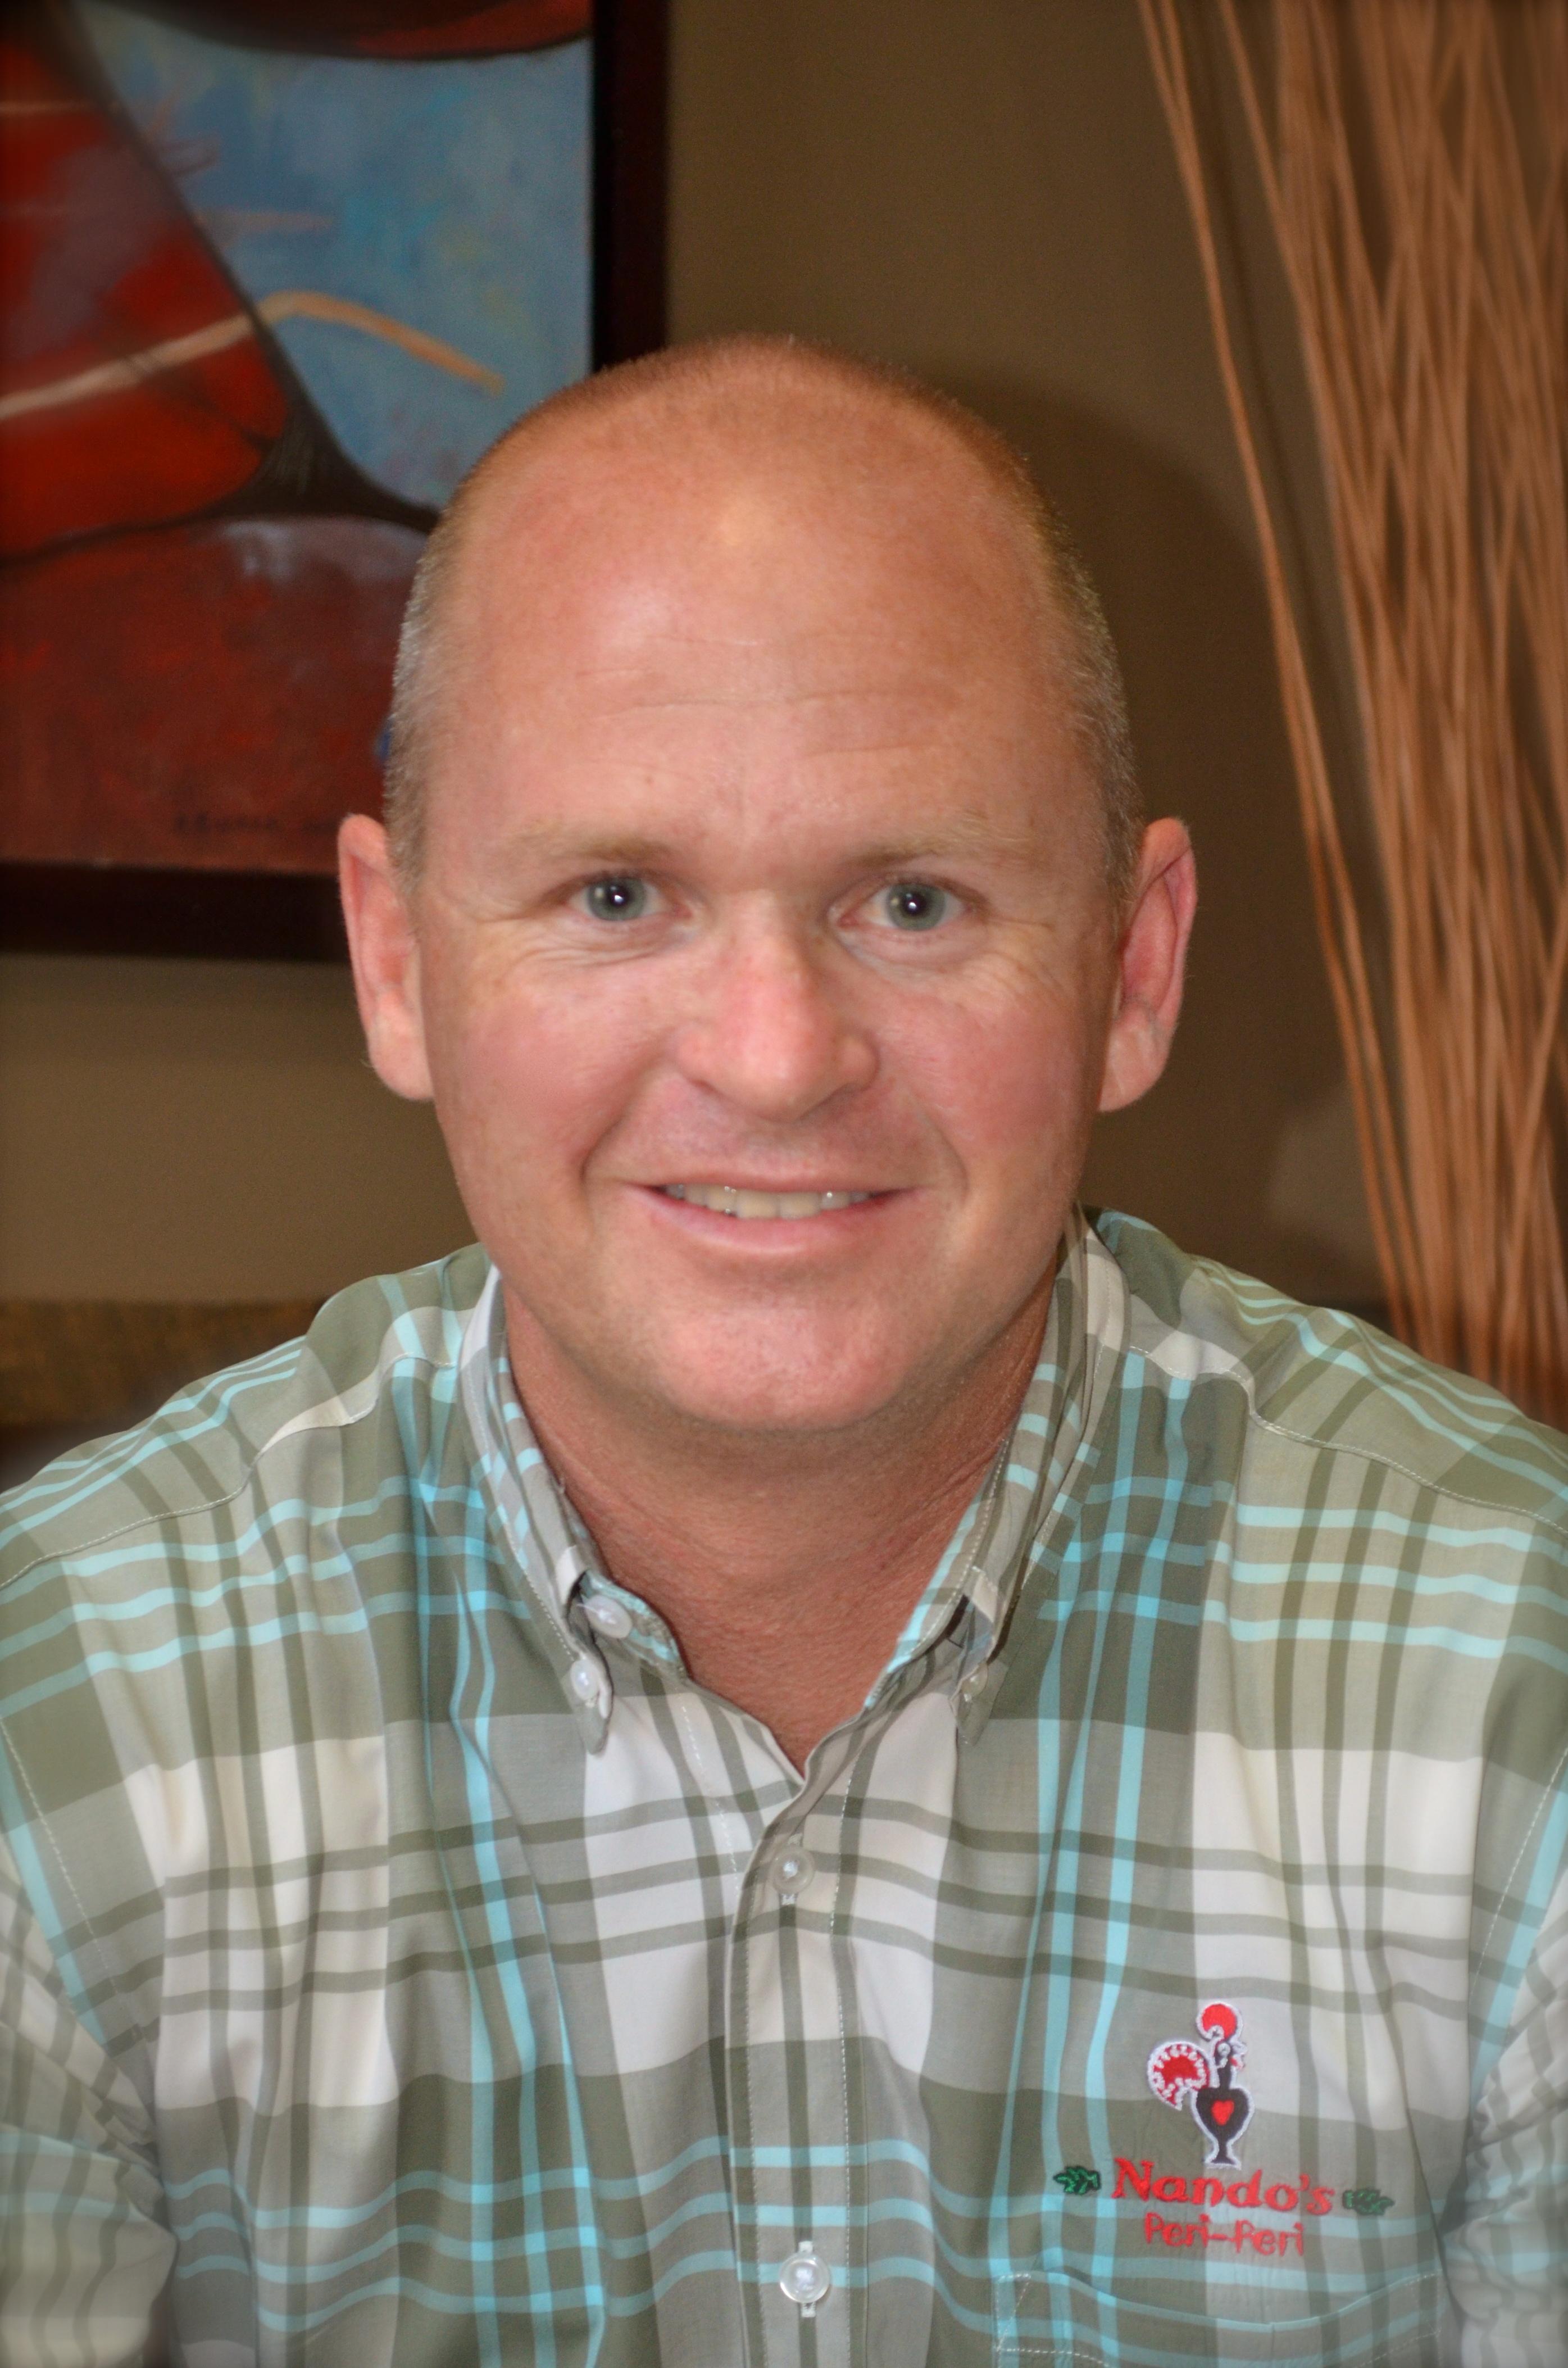 Nando's U.S. CEO Burton Heiss